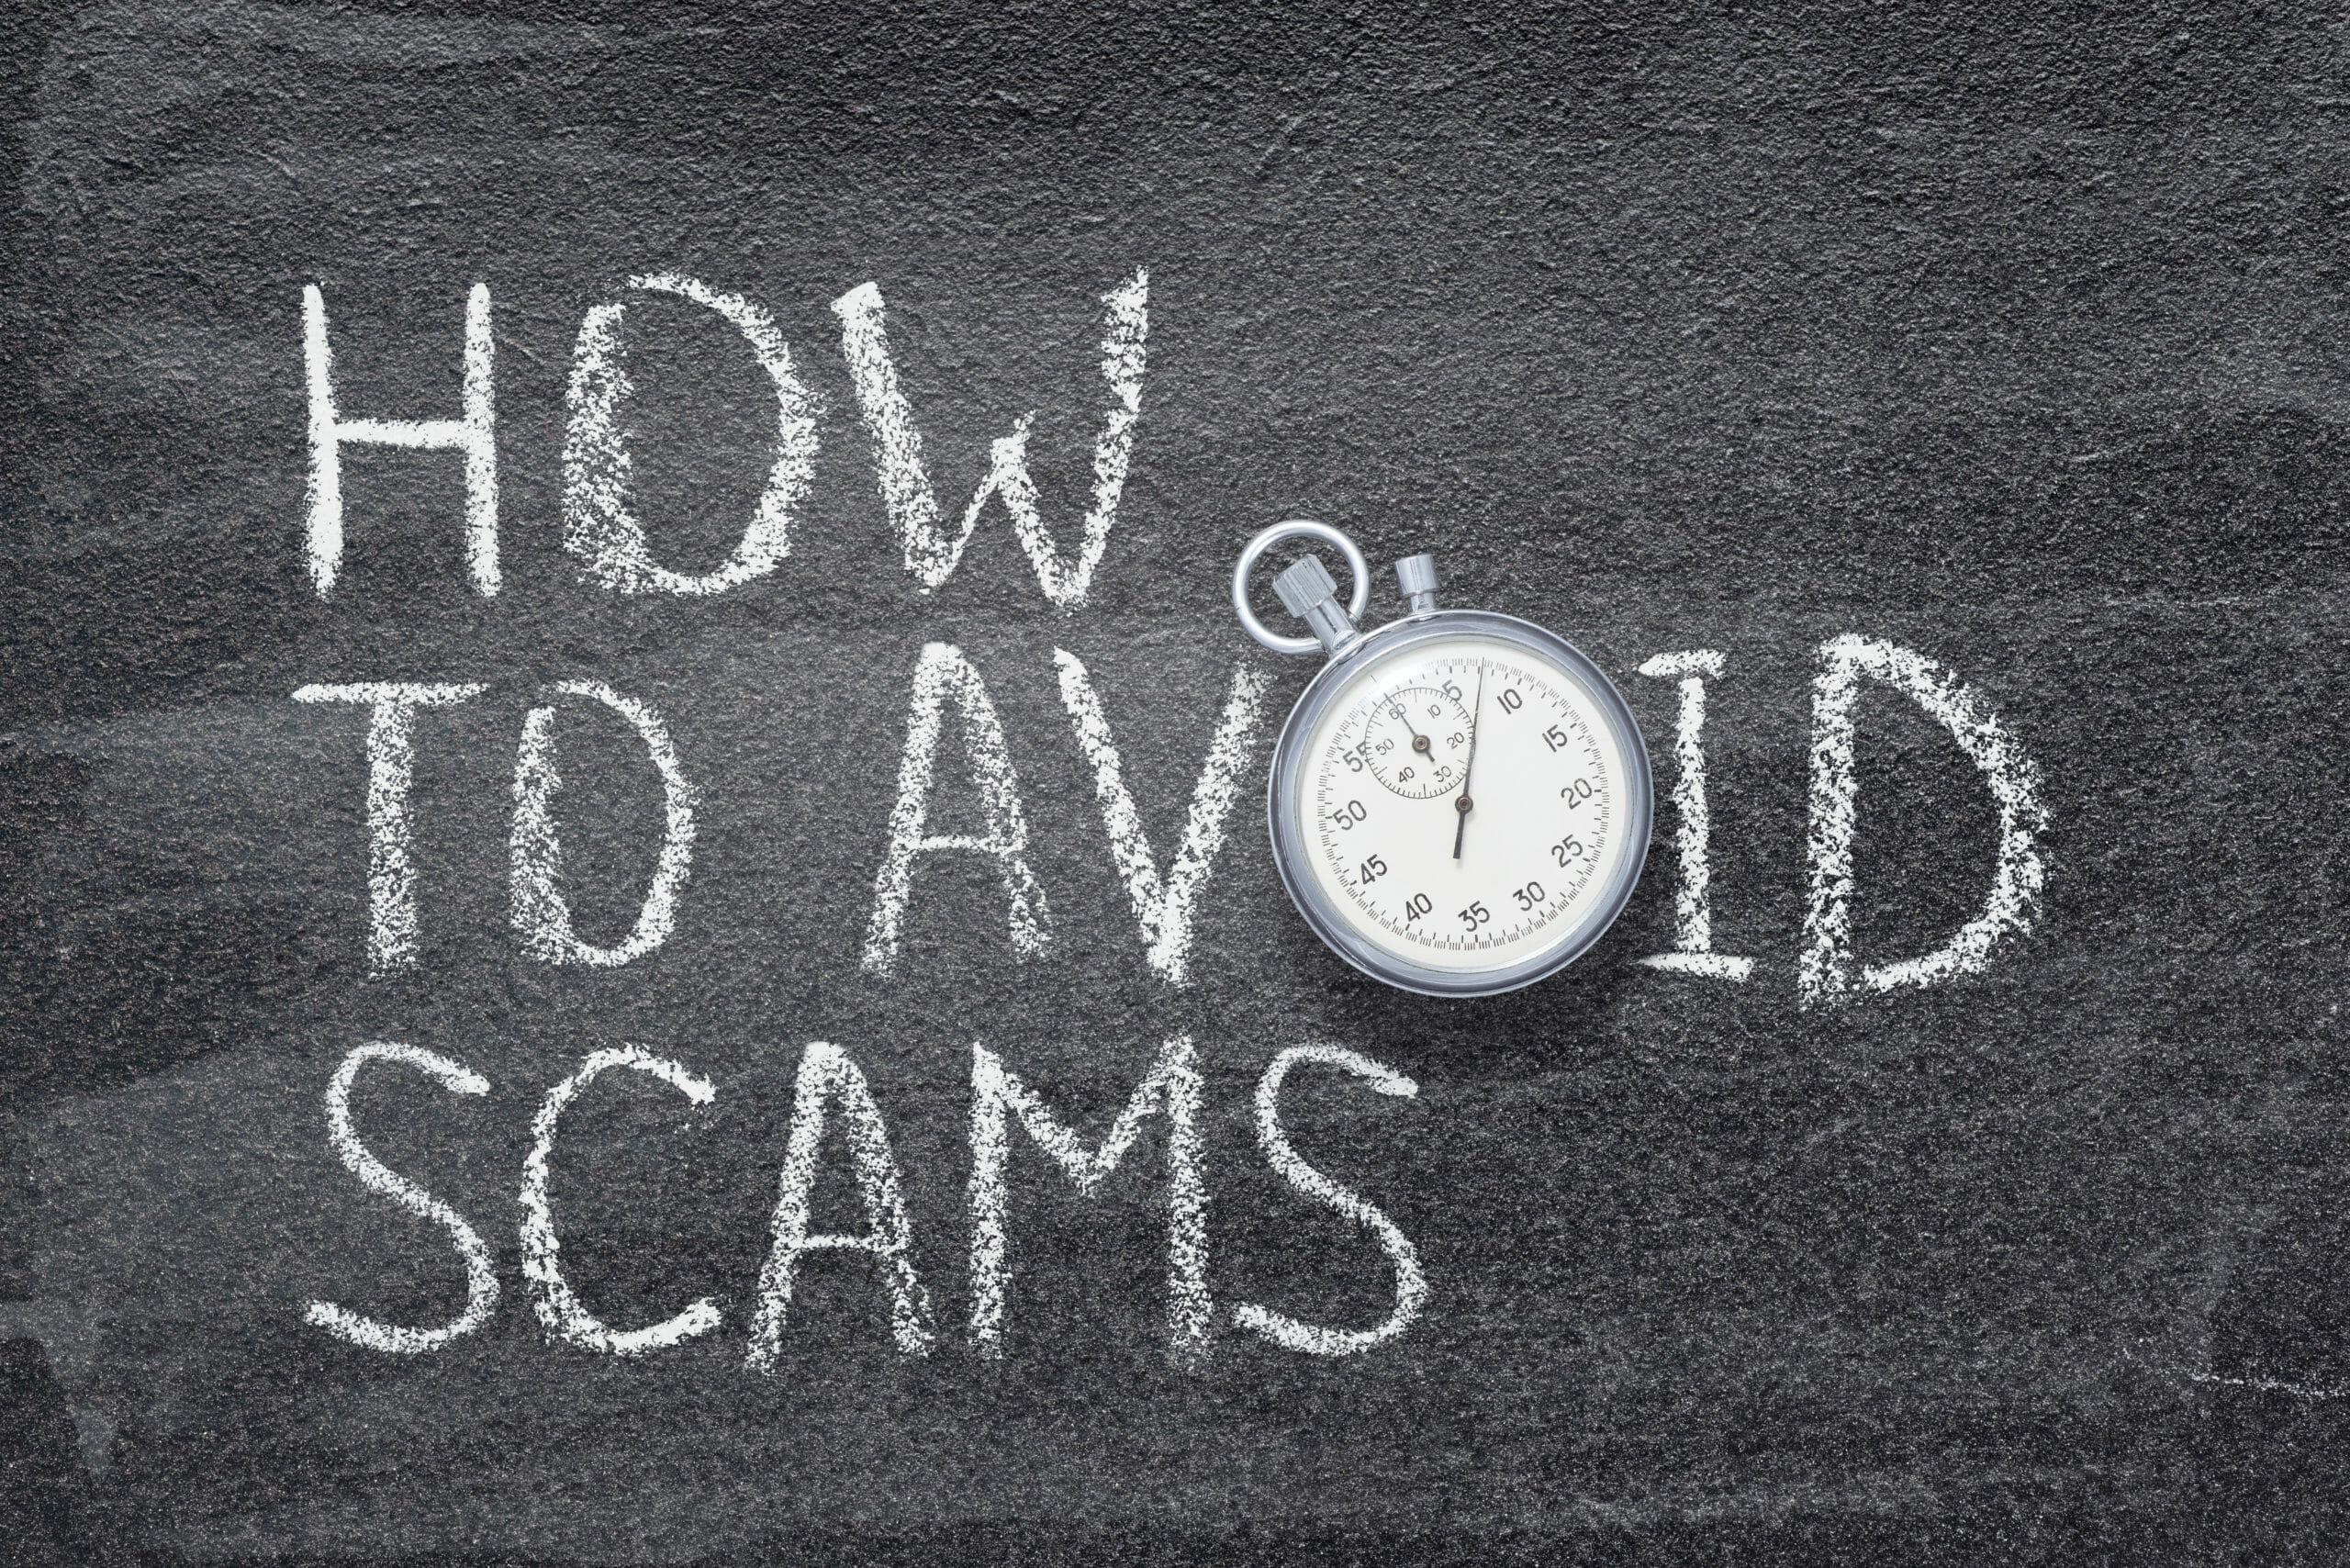 how-avoid-scams-phrase-written-on-1176599833